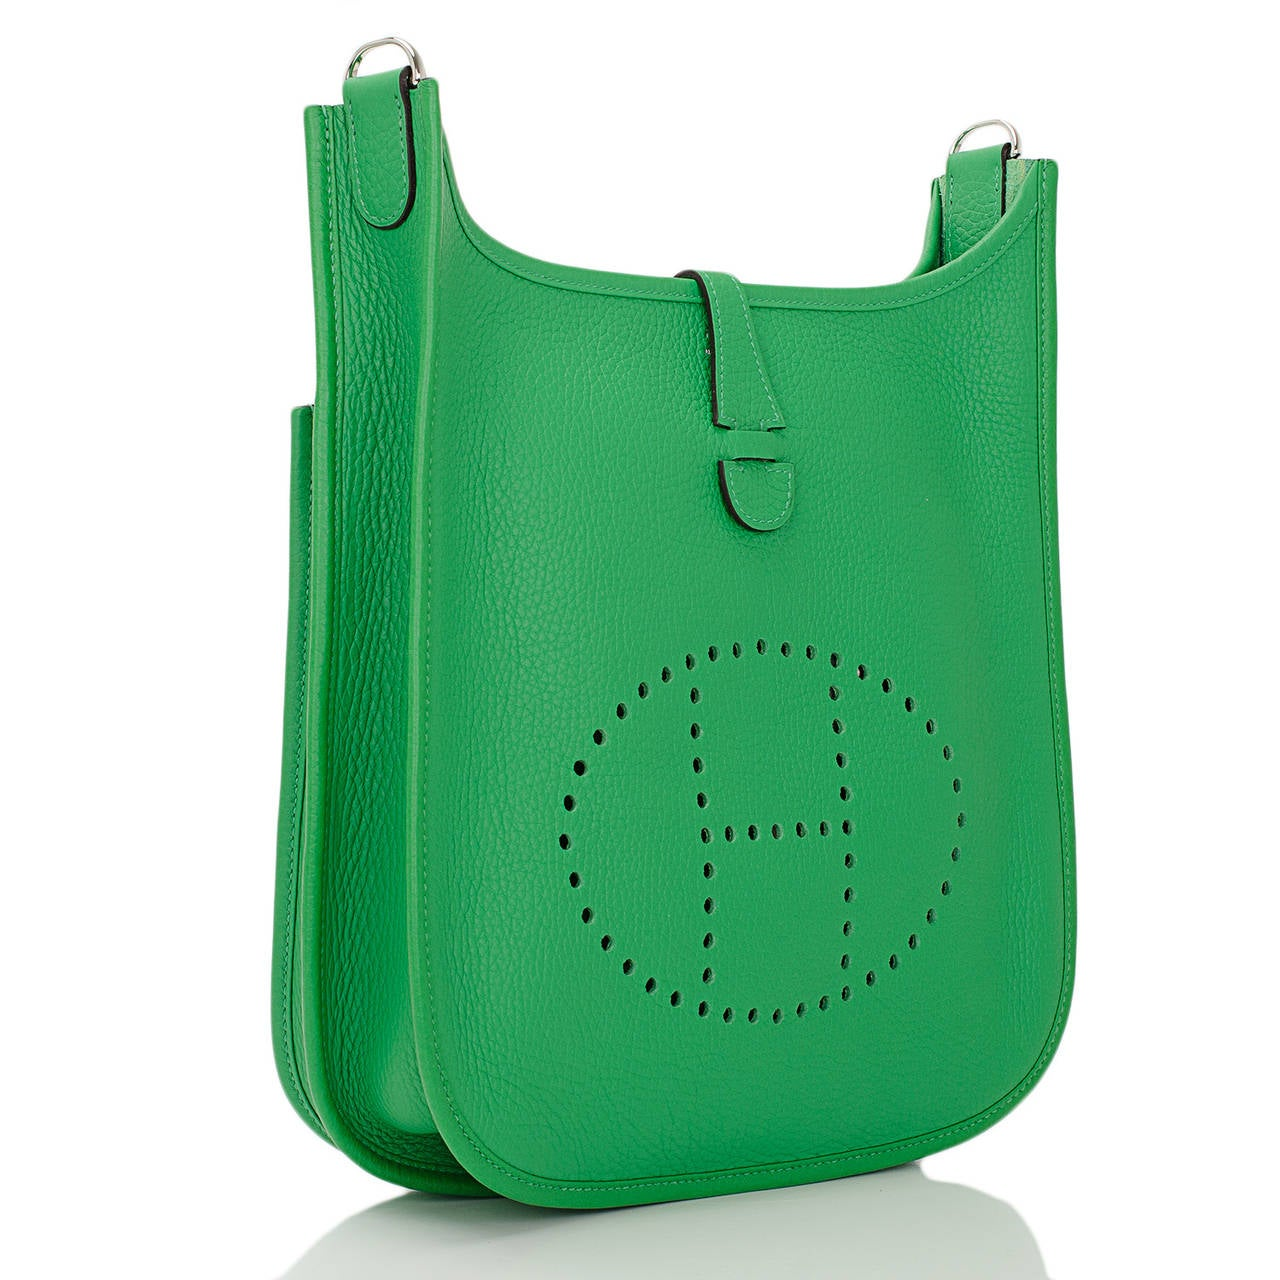 cheap hermes bags - Hermes Bamboo Clemence Evelyne III PM at 1stdibs